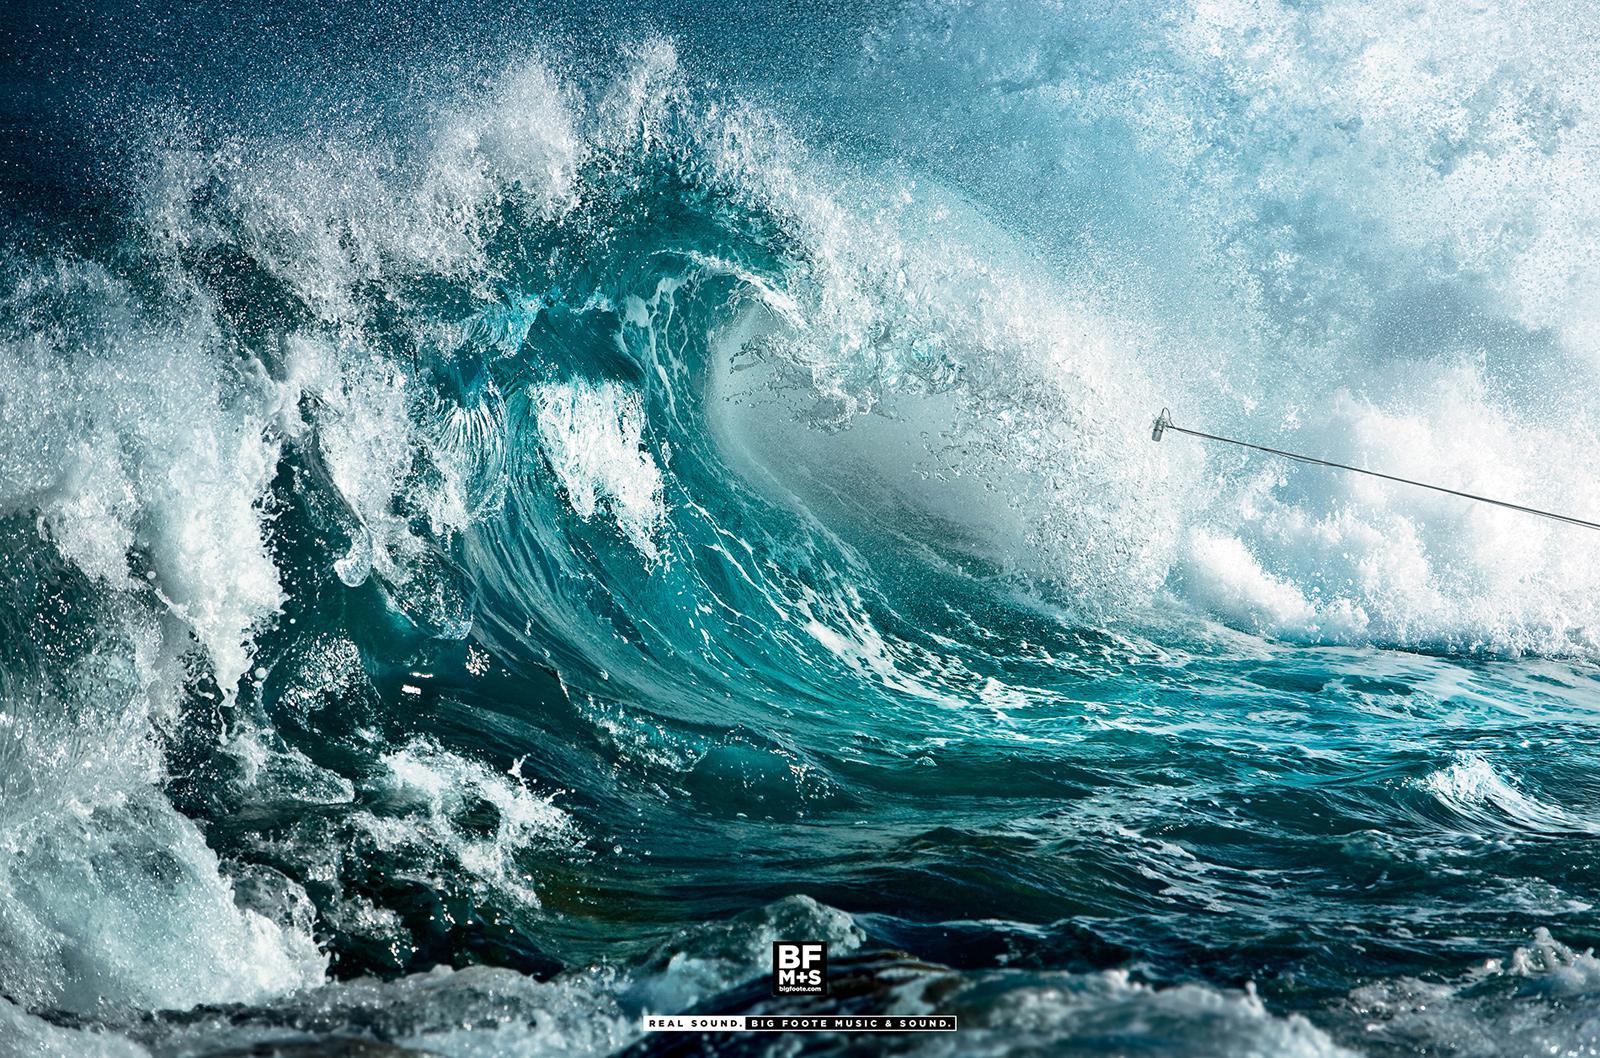 Big Foote Music & Sound Print Ad -  Tsunami